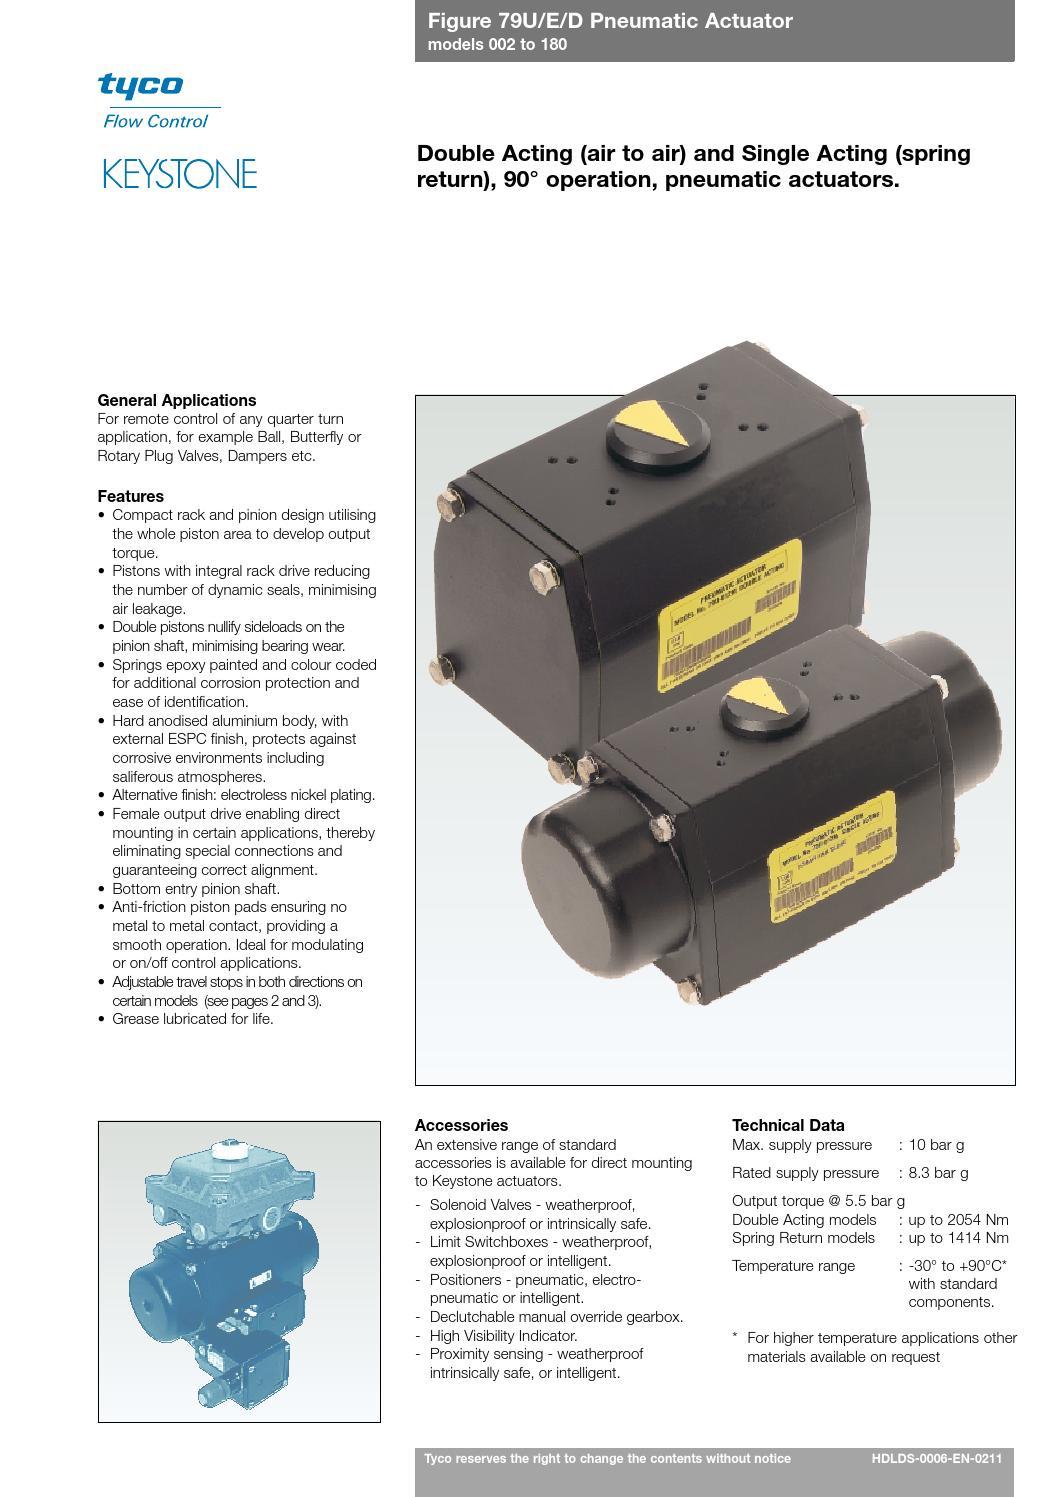 Keystone pneumatic actuator 79u manual